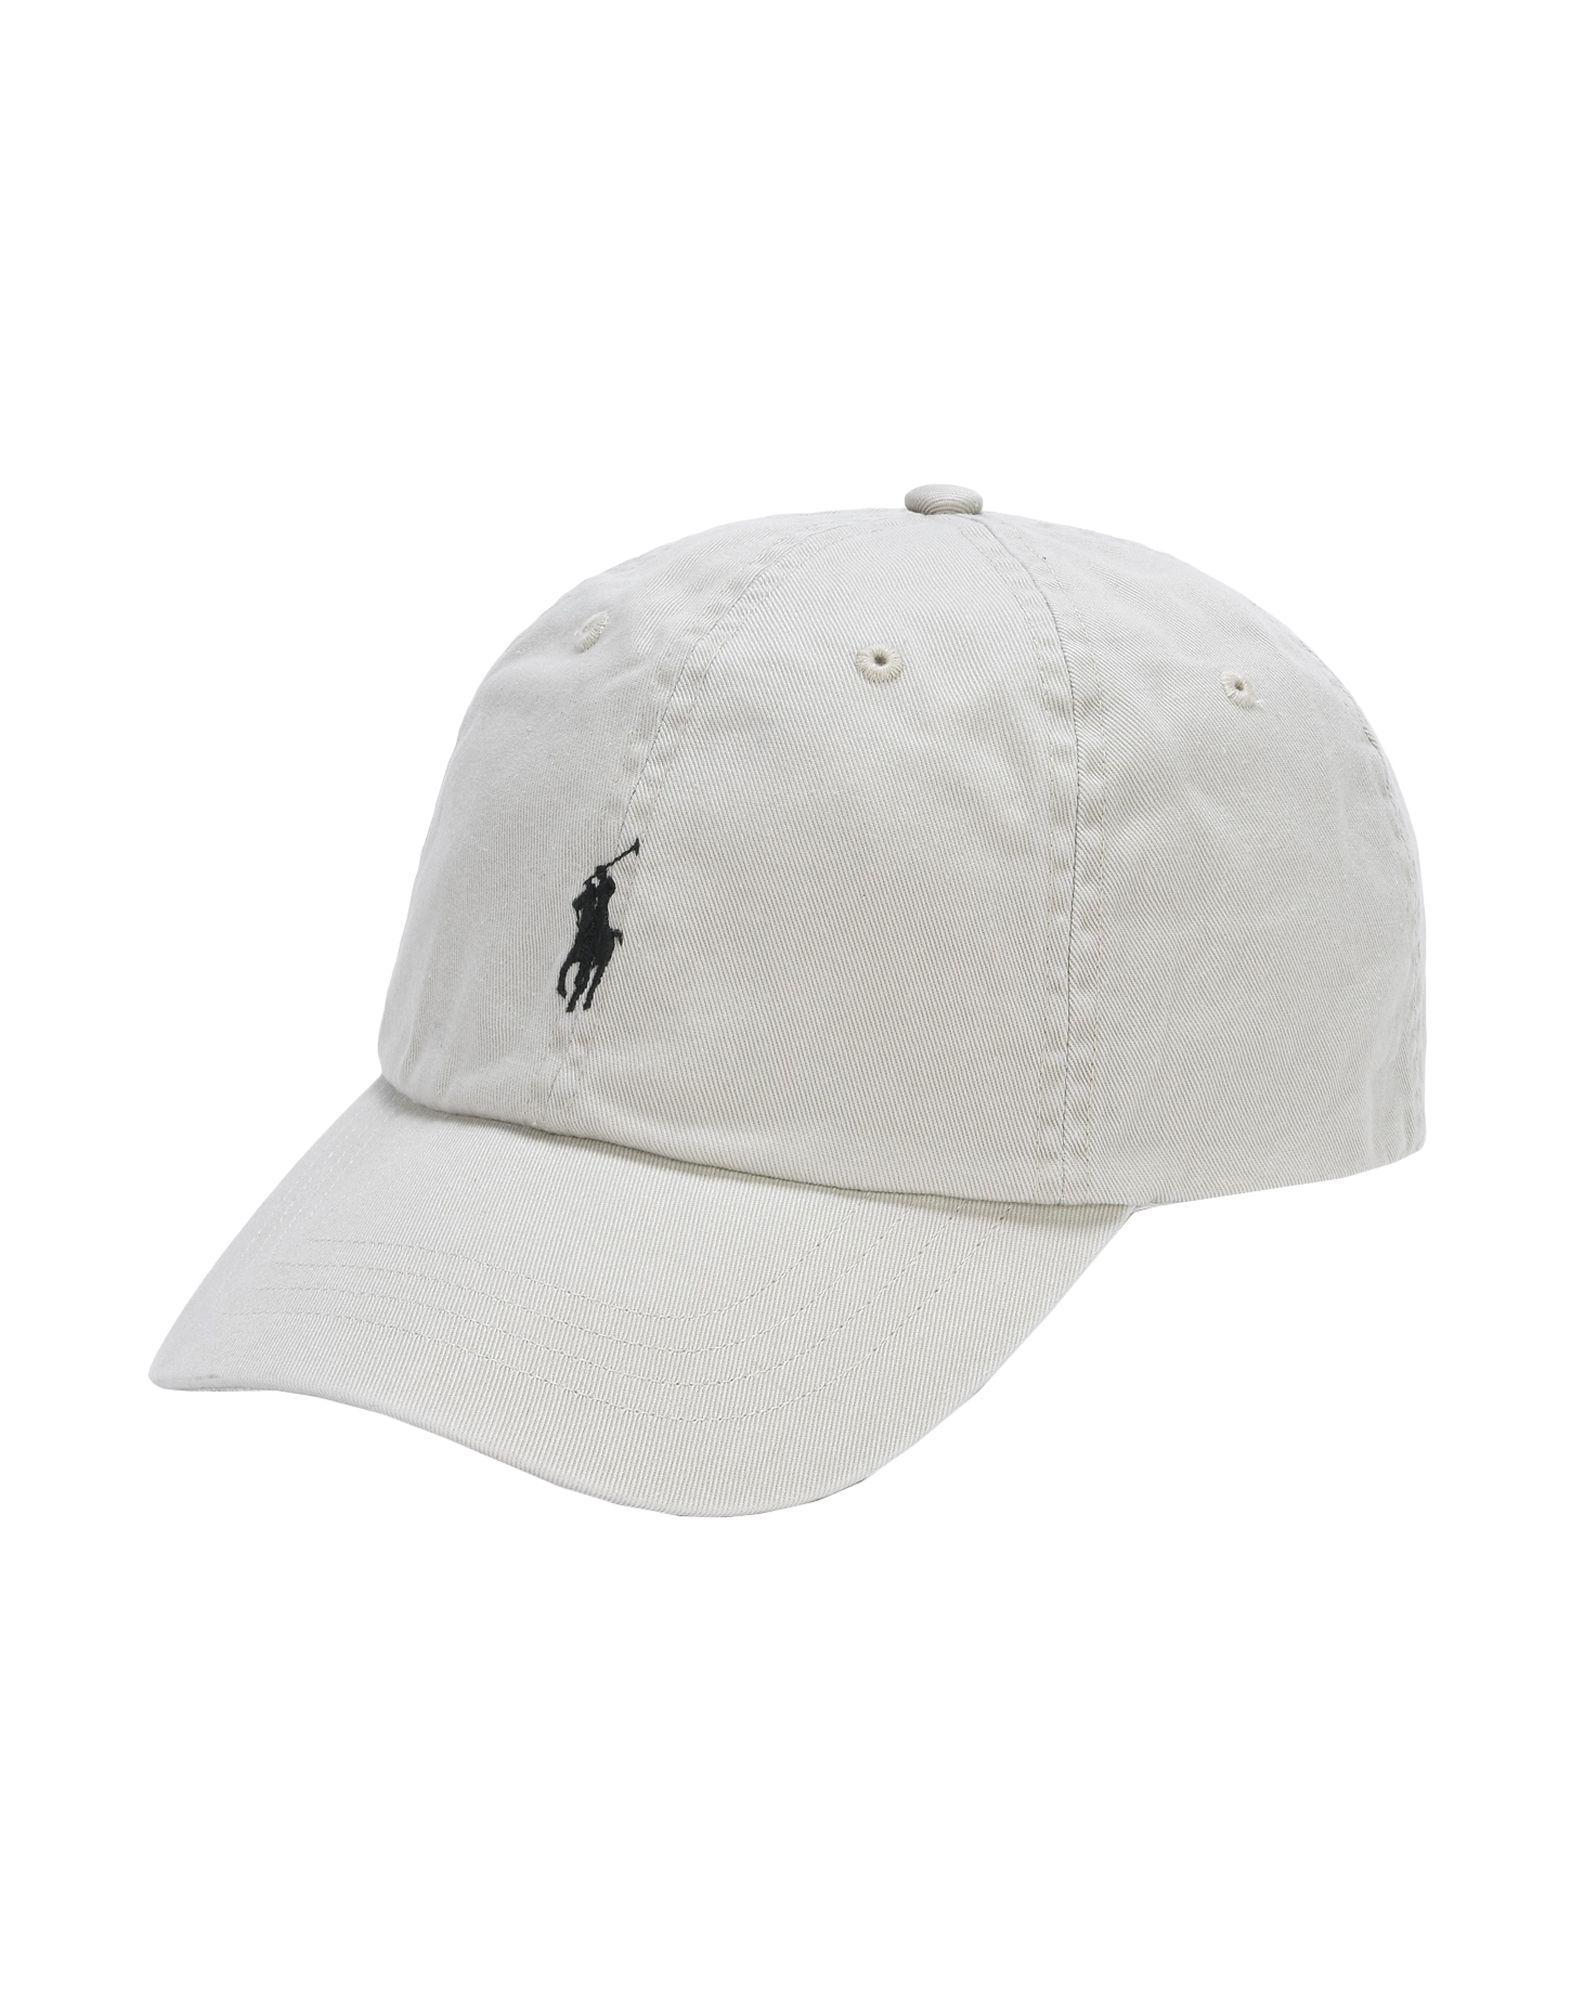 781d7754a47 Polo Ralph Lauren Hat in Gray for Men - Lyst